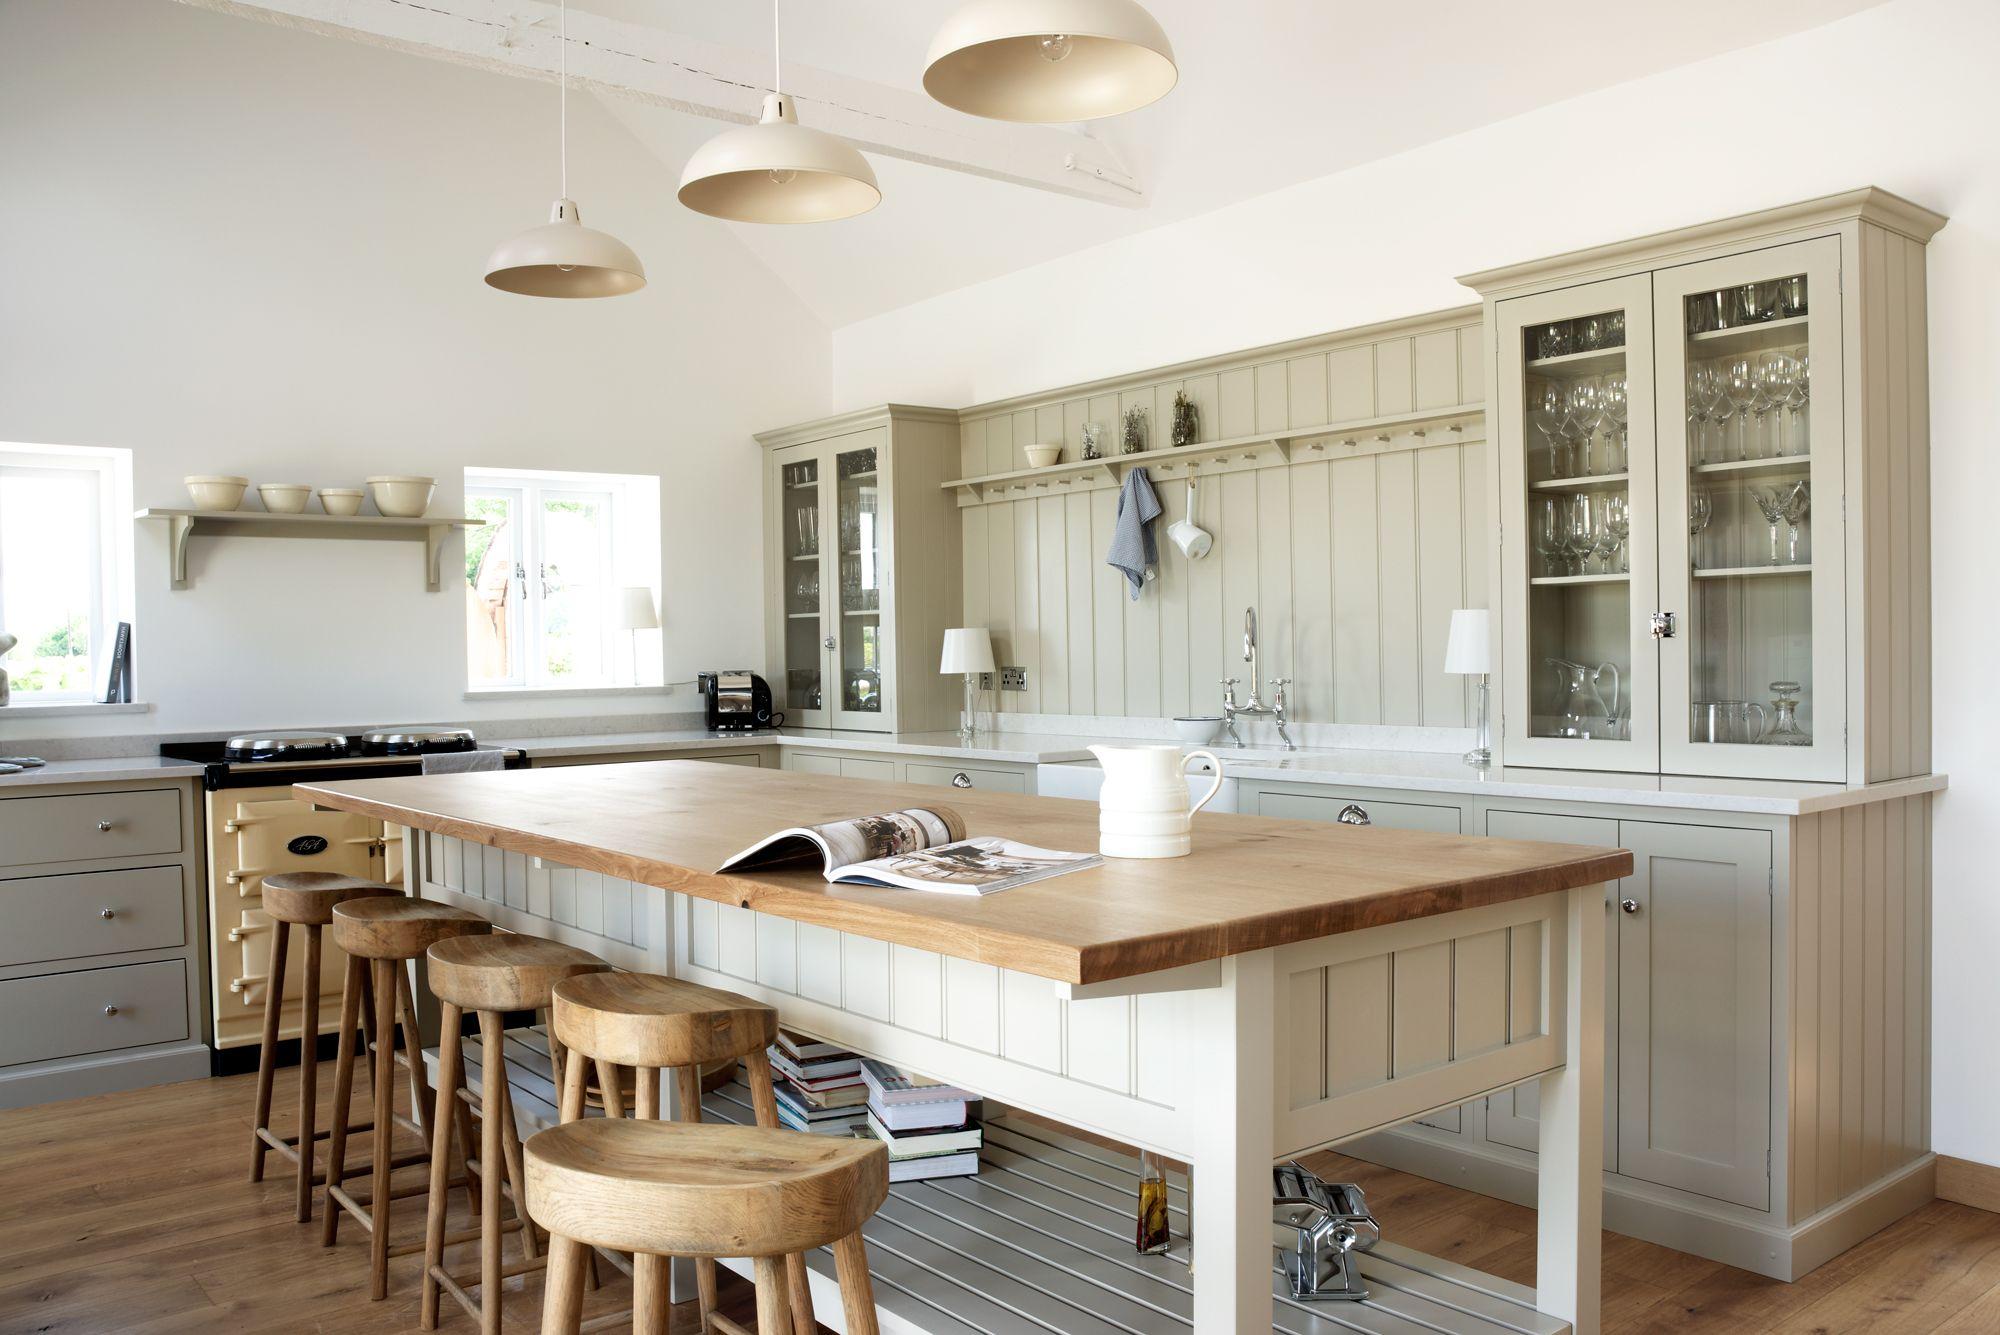 Shelf across kitchen window  pin by velezsaus closet on cocina  pinterest  shaker kitchen barn